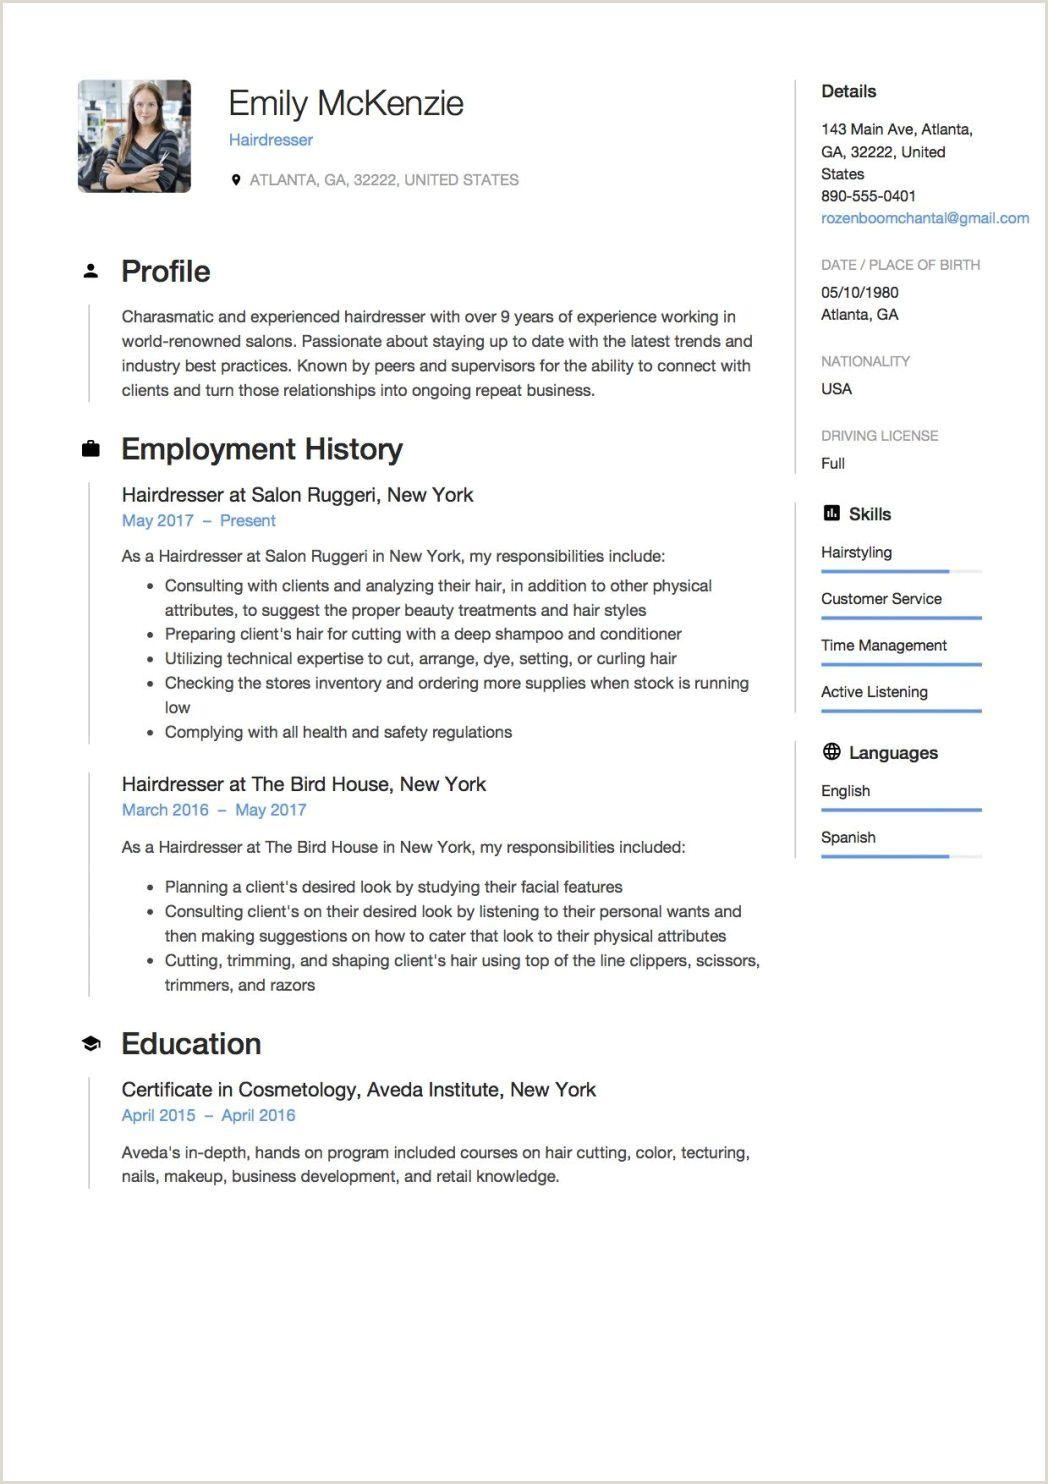 Fresher Resume Latest format Fresher Resume Latest format